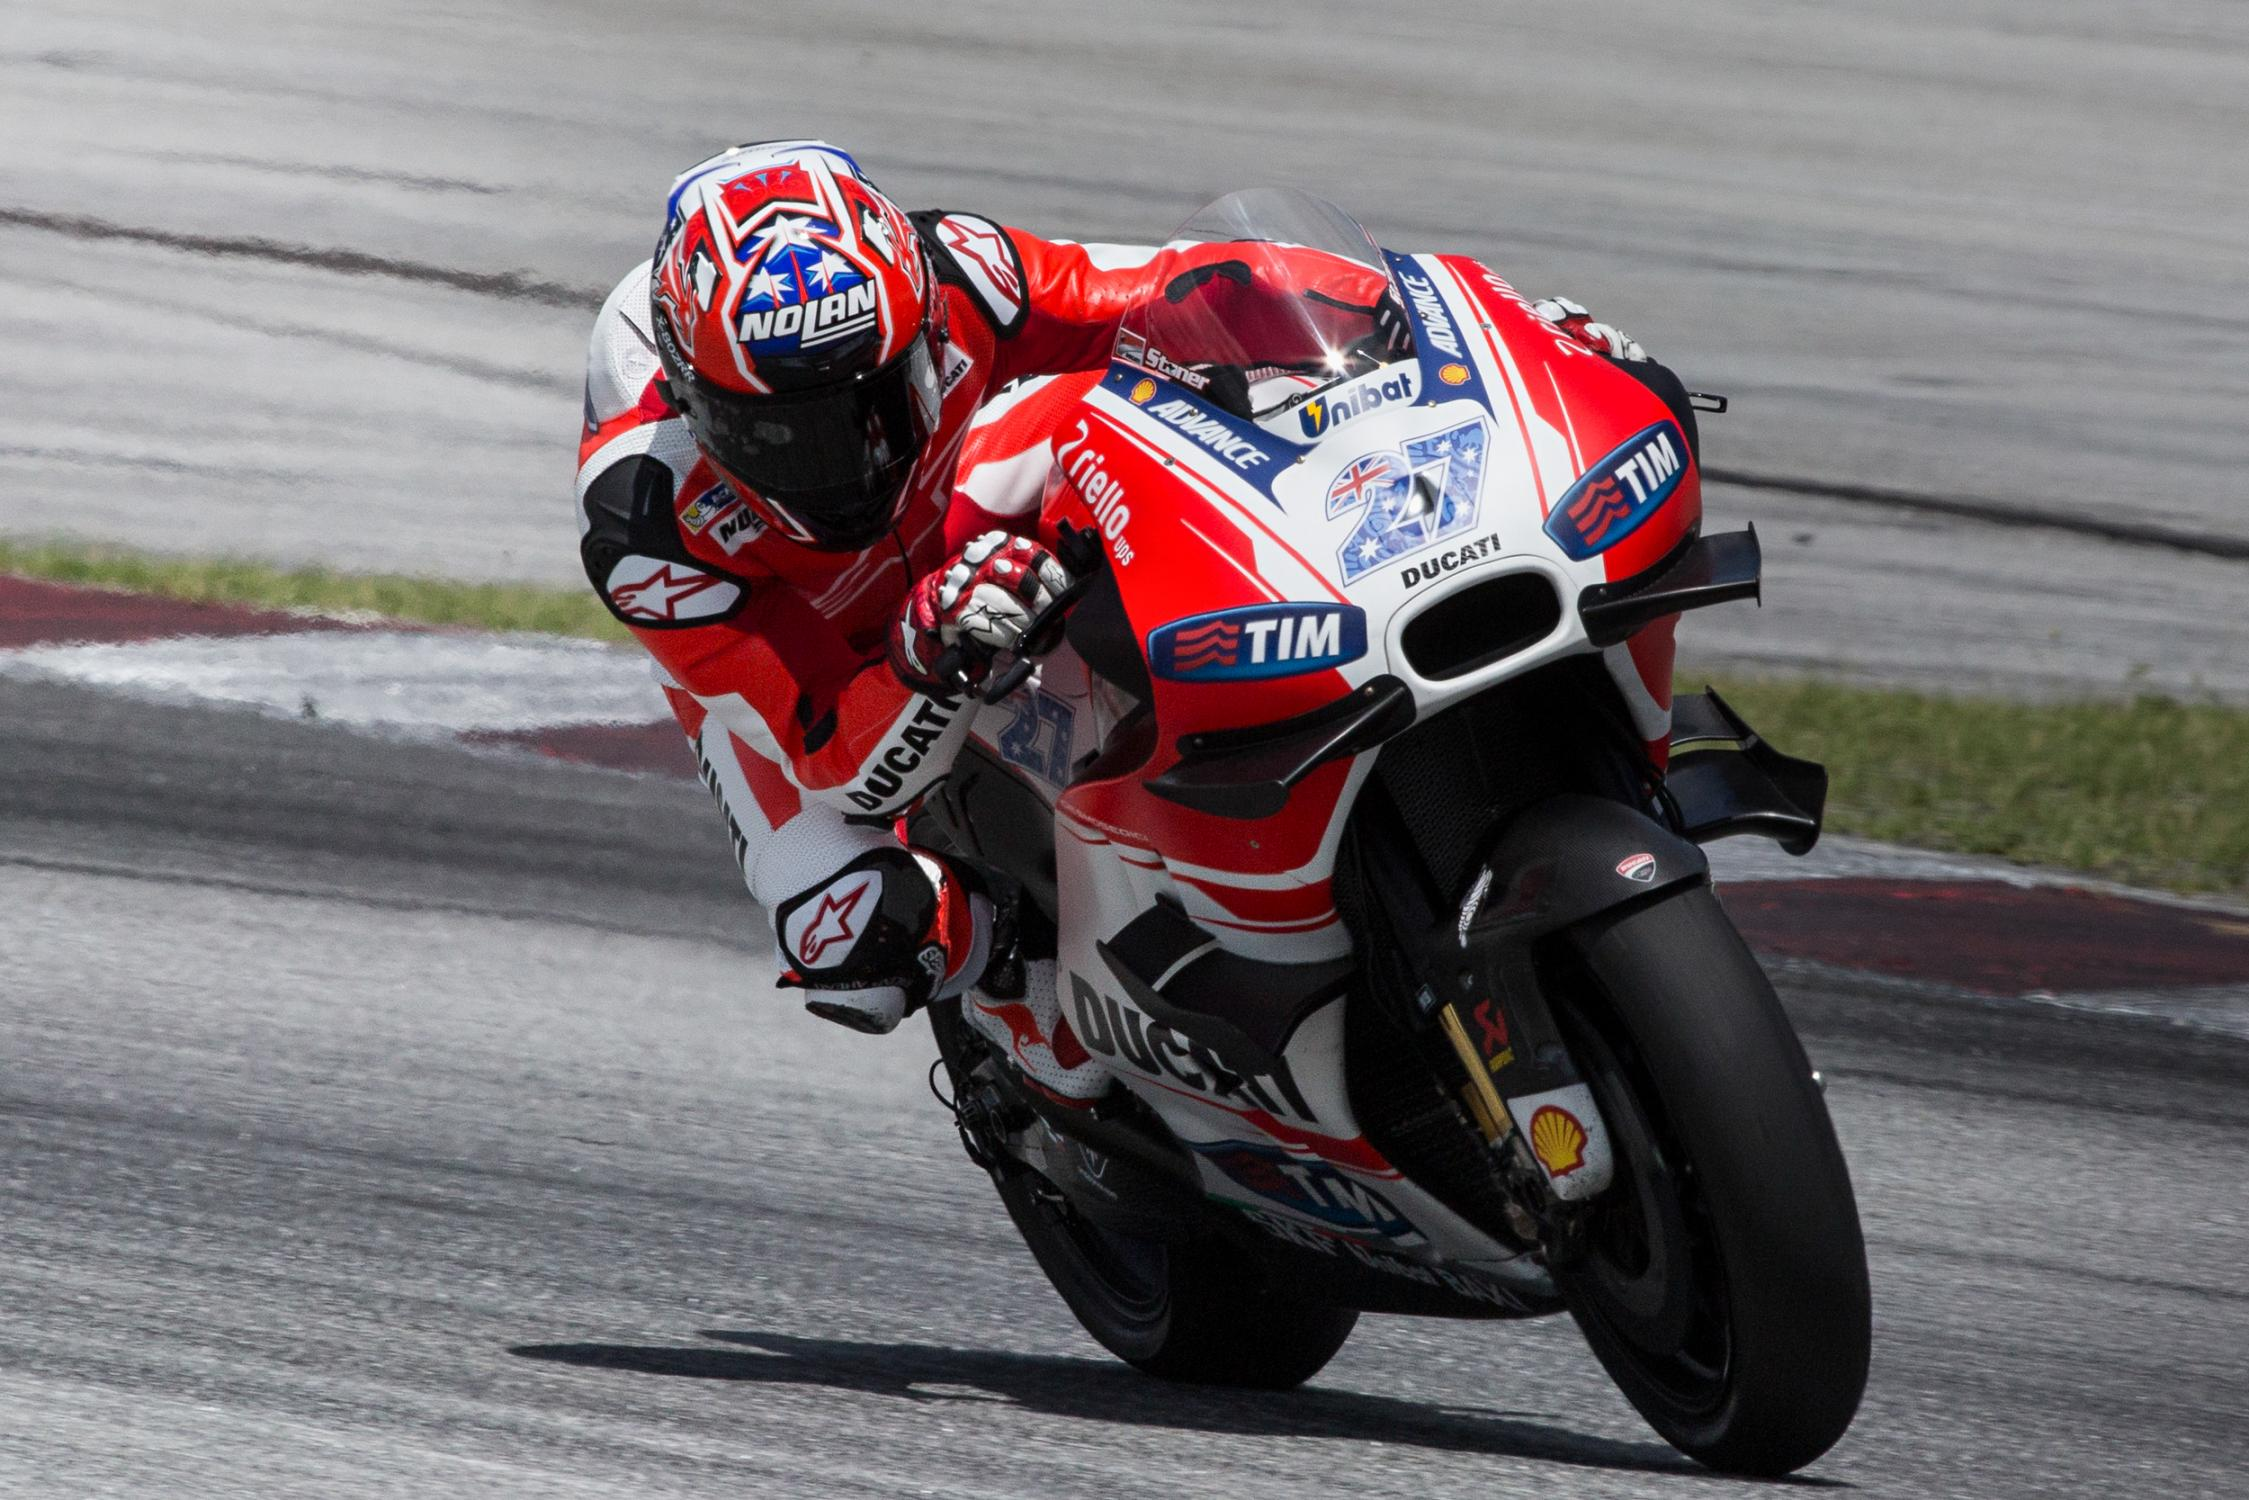 Test MotoGP Sepang 2016 - Page 2 27-casey-stoner_2-ok_tstmal-00439.gallery_full_top_fullscreen